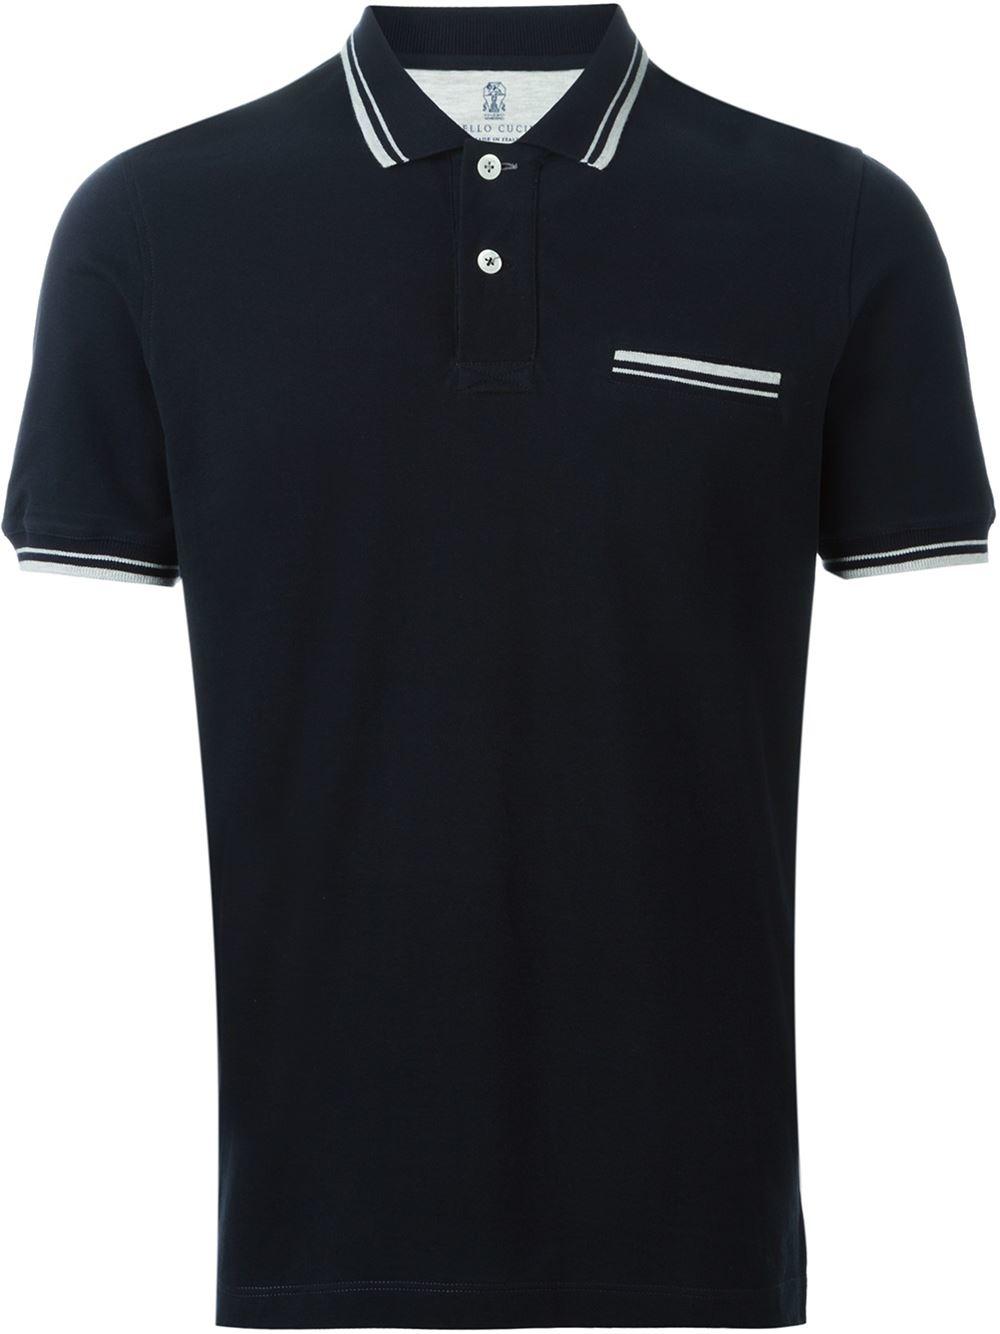 Brunello cucinelli chest pocket polo shirt in blue for men for Men s polo shirts with chest pocket